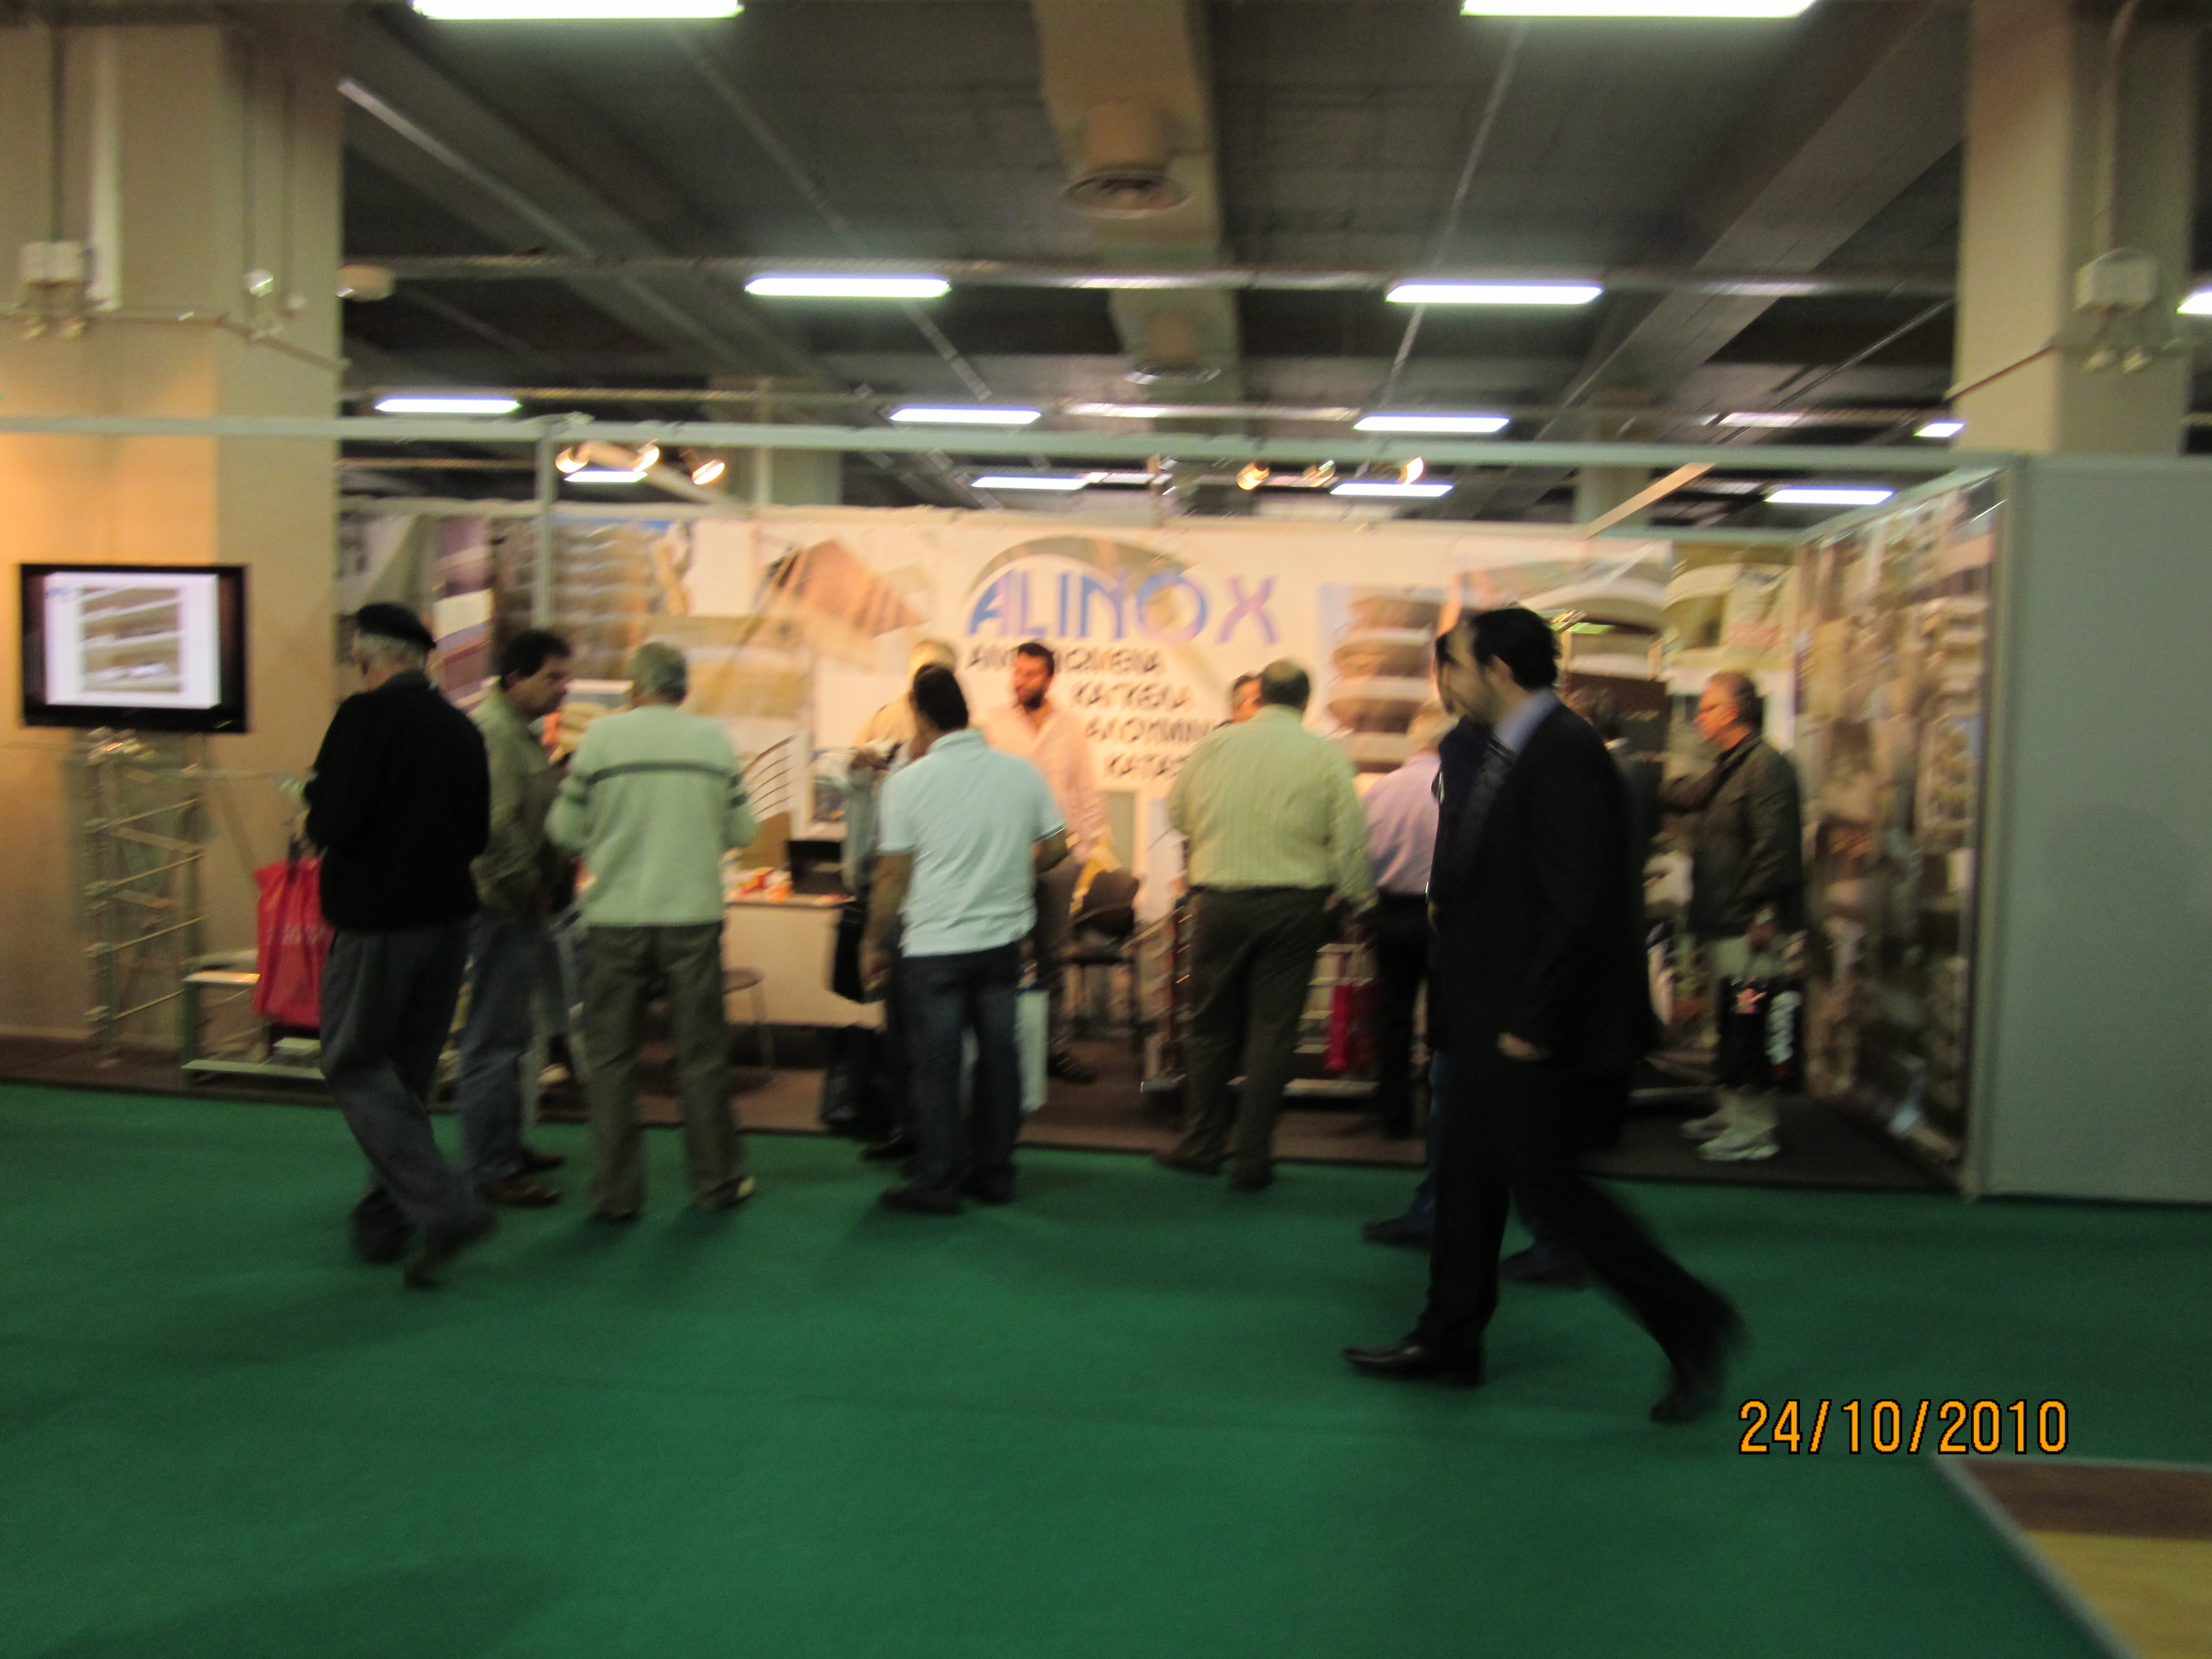 Expo_Athens_6.JPG